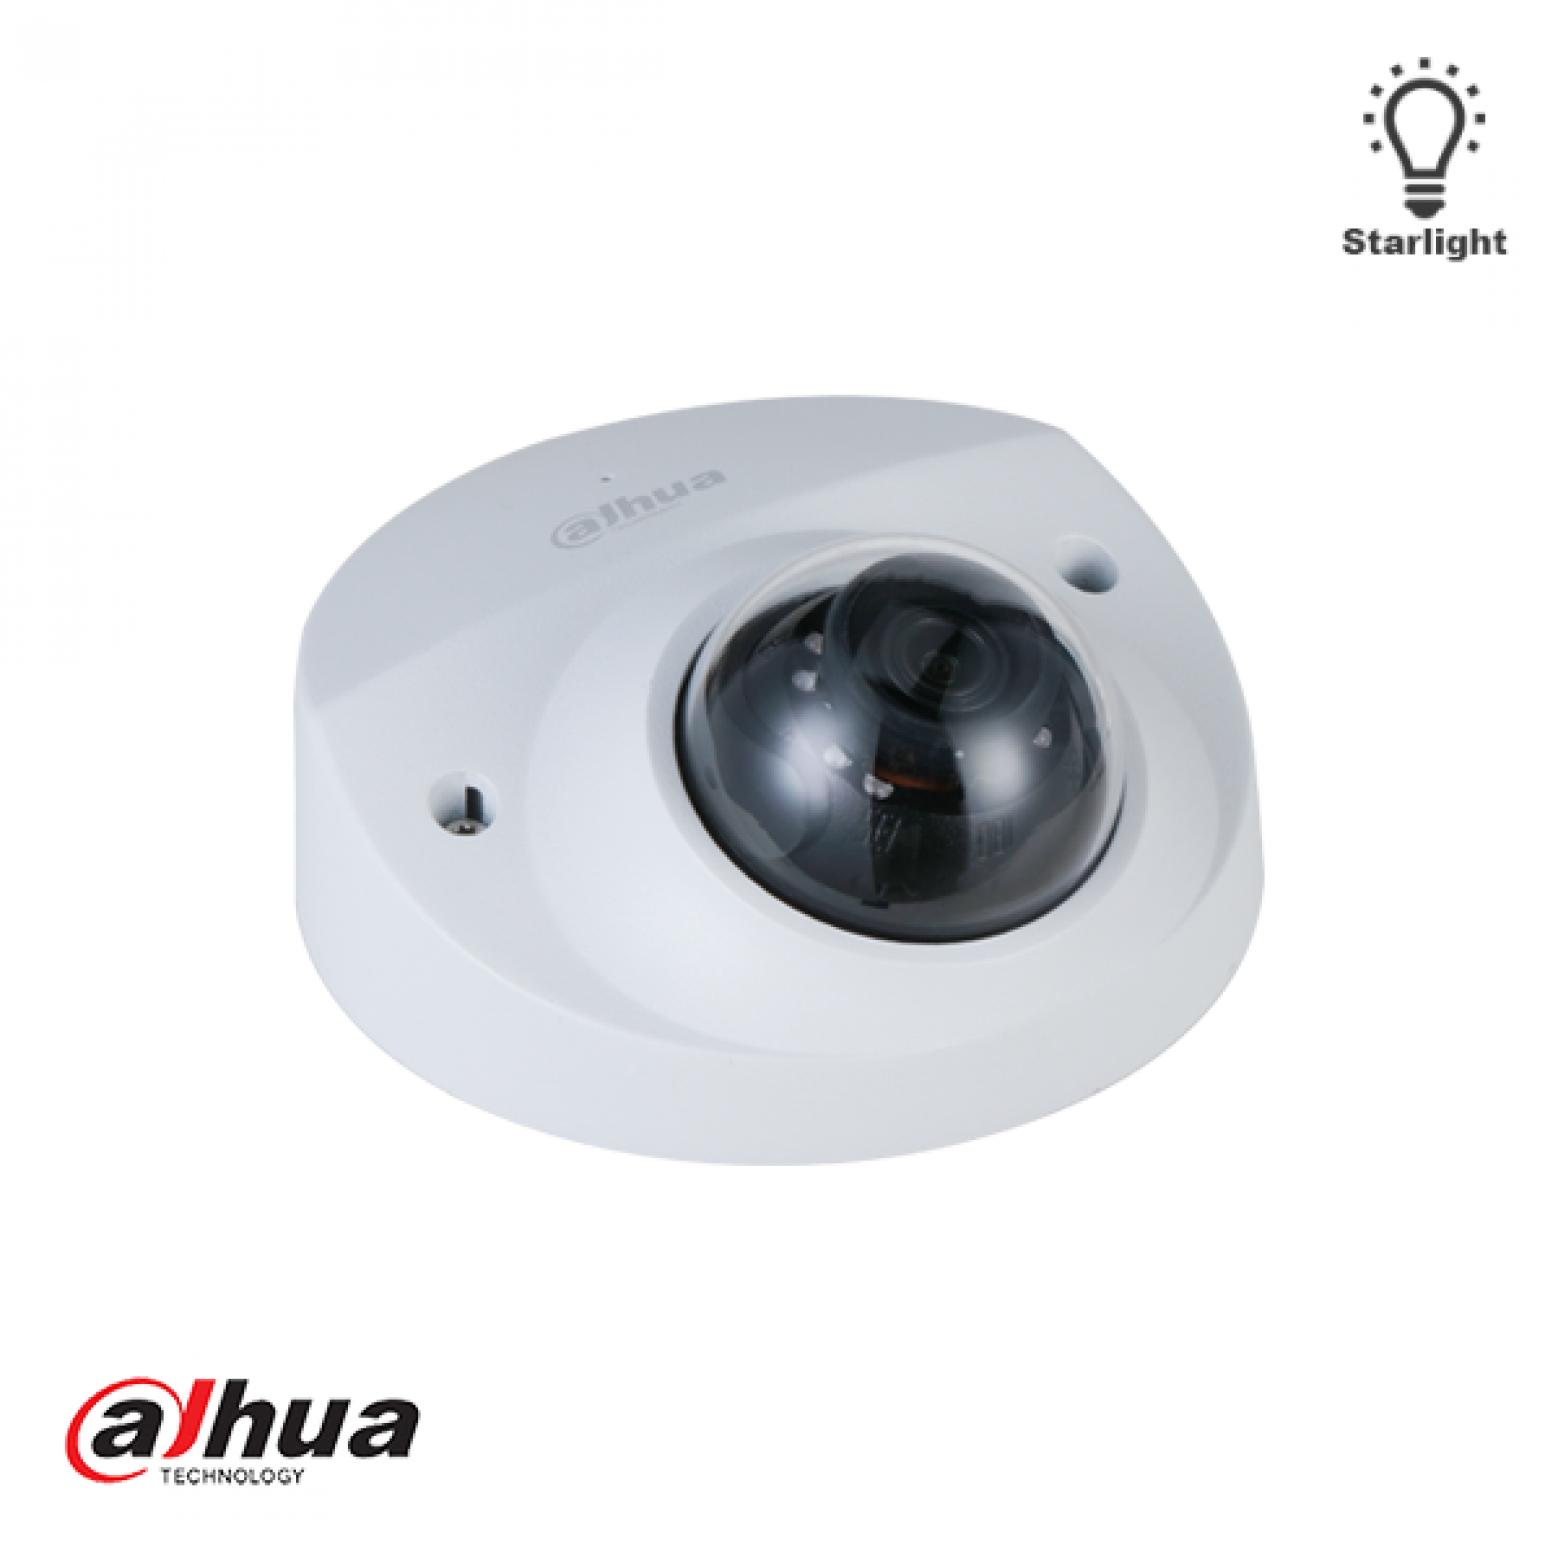 Dahua IPC-HDBW3241F-AS-M-28 2MP Lite AI IR Fixed focal Dome Network Camera 2.8mm